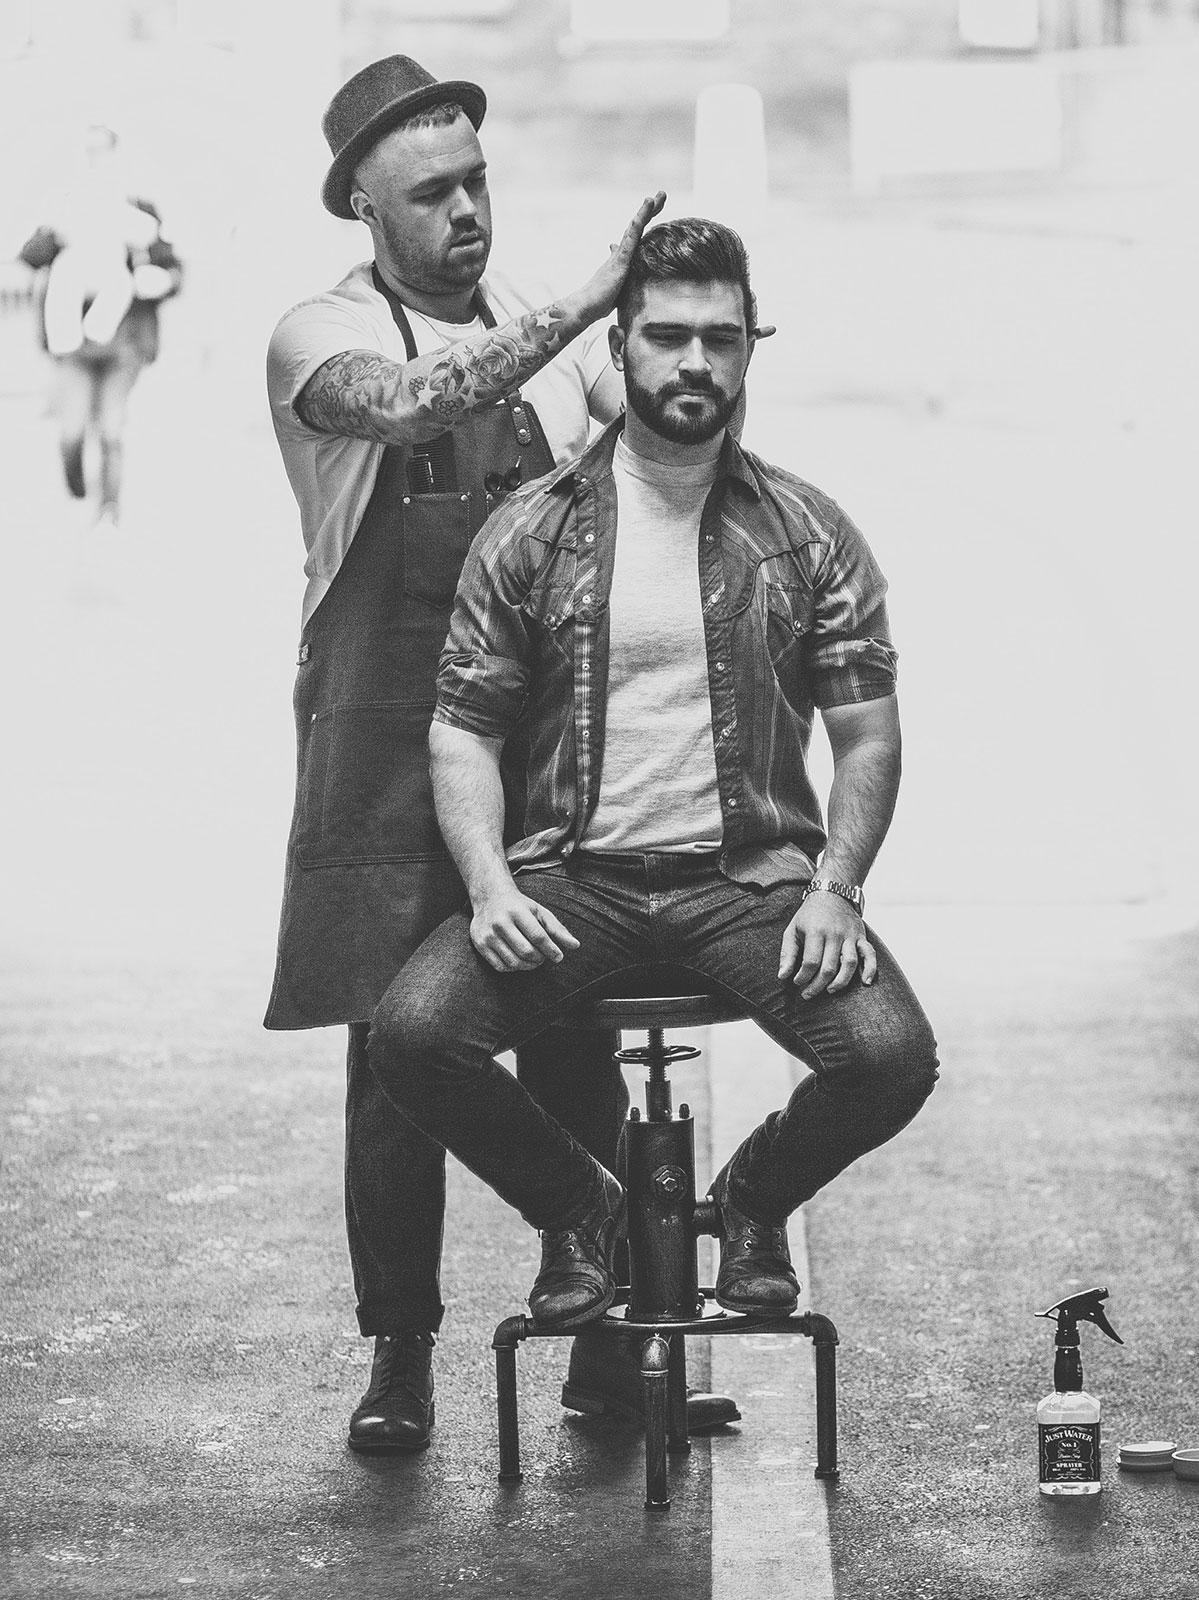 barber-shop-about.jpg